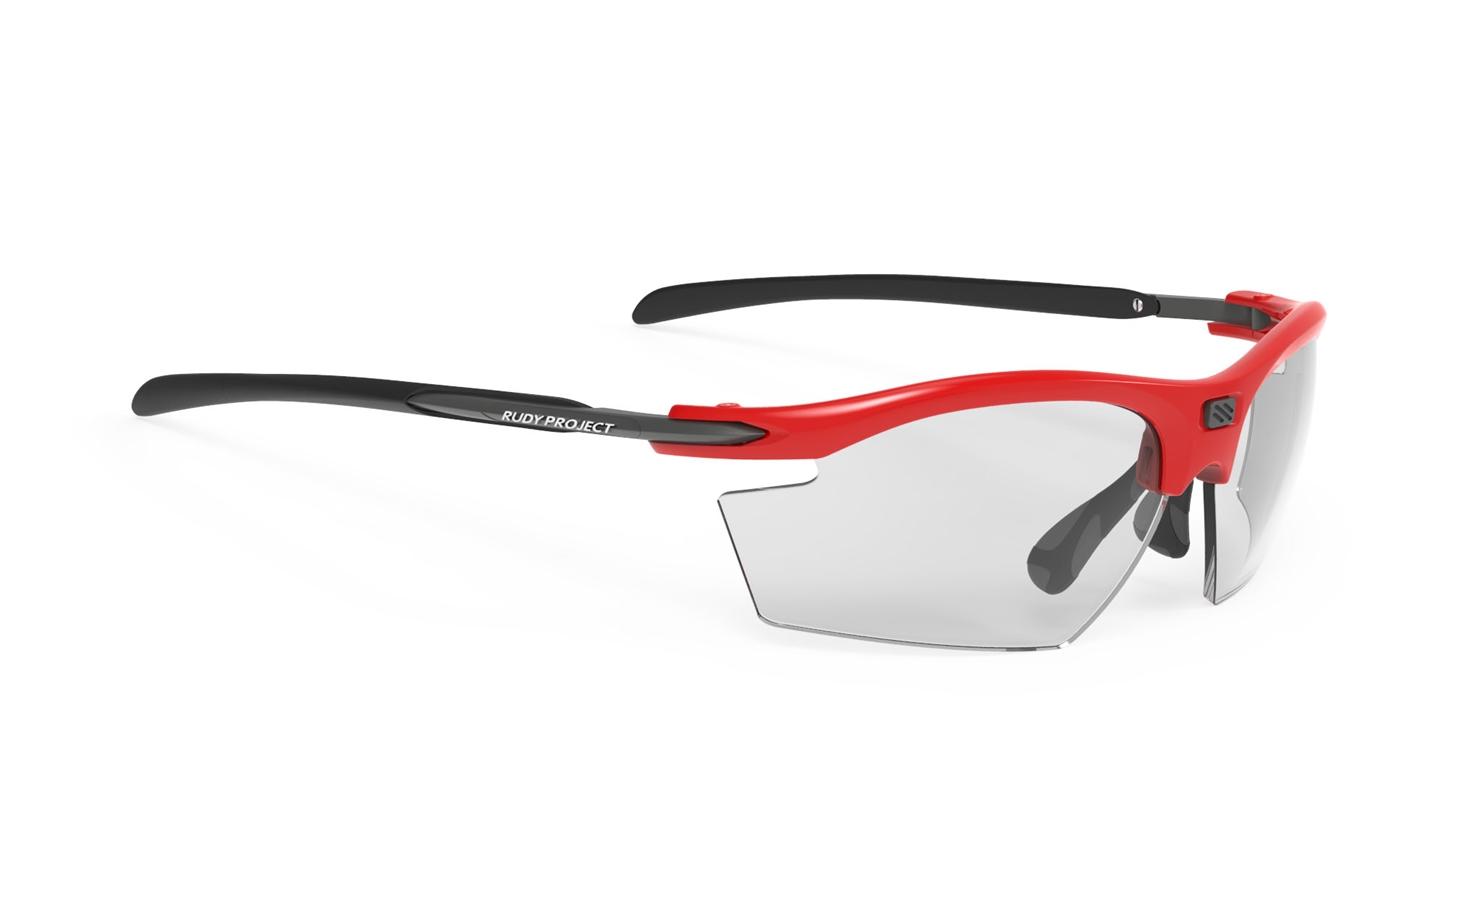 063519616f3 Performance Eyewear Rydon - Rudy Project